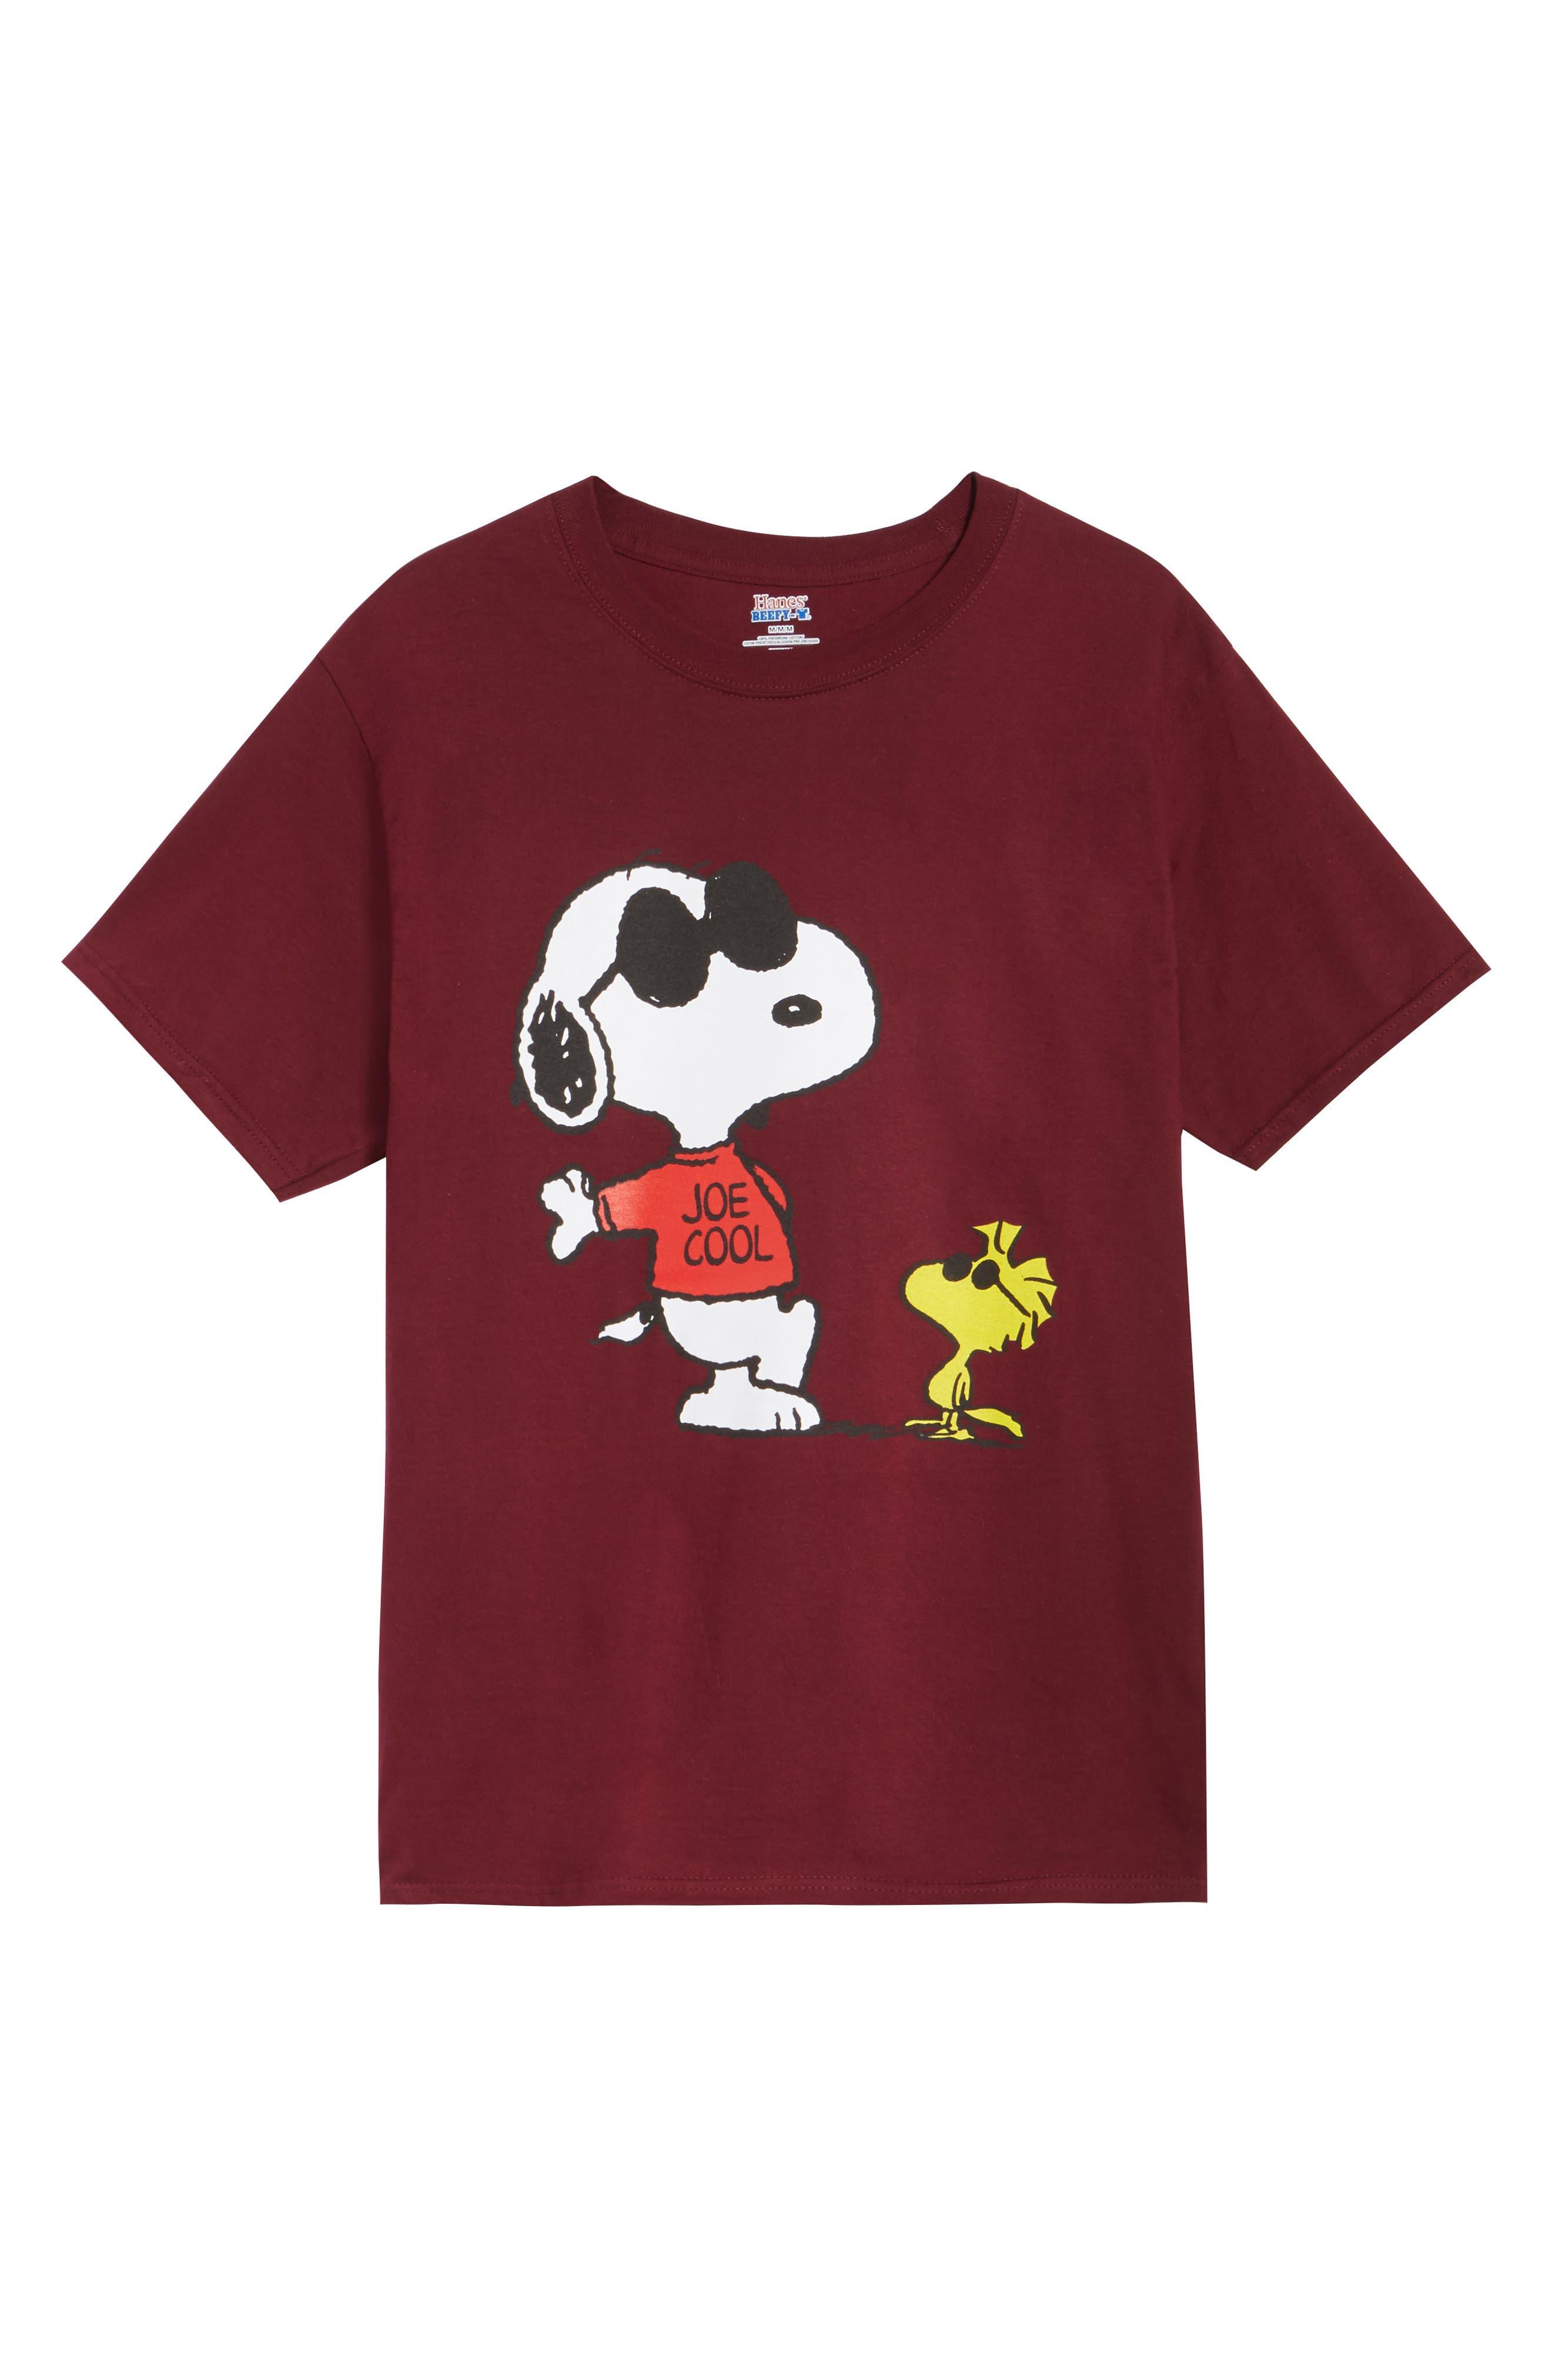 HANES Peanuts Joe Cool T-Shirt